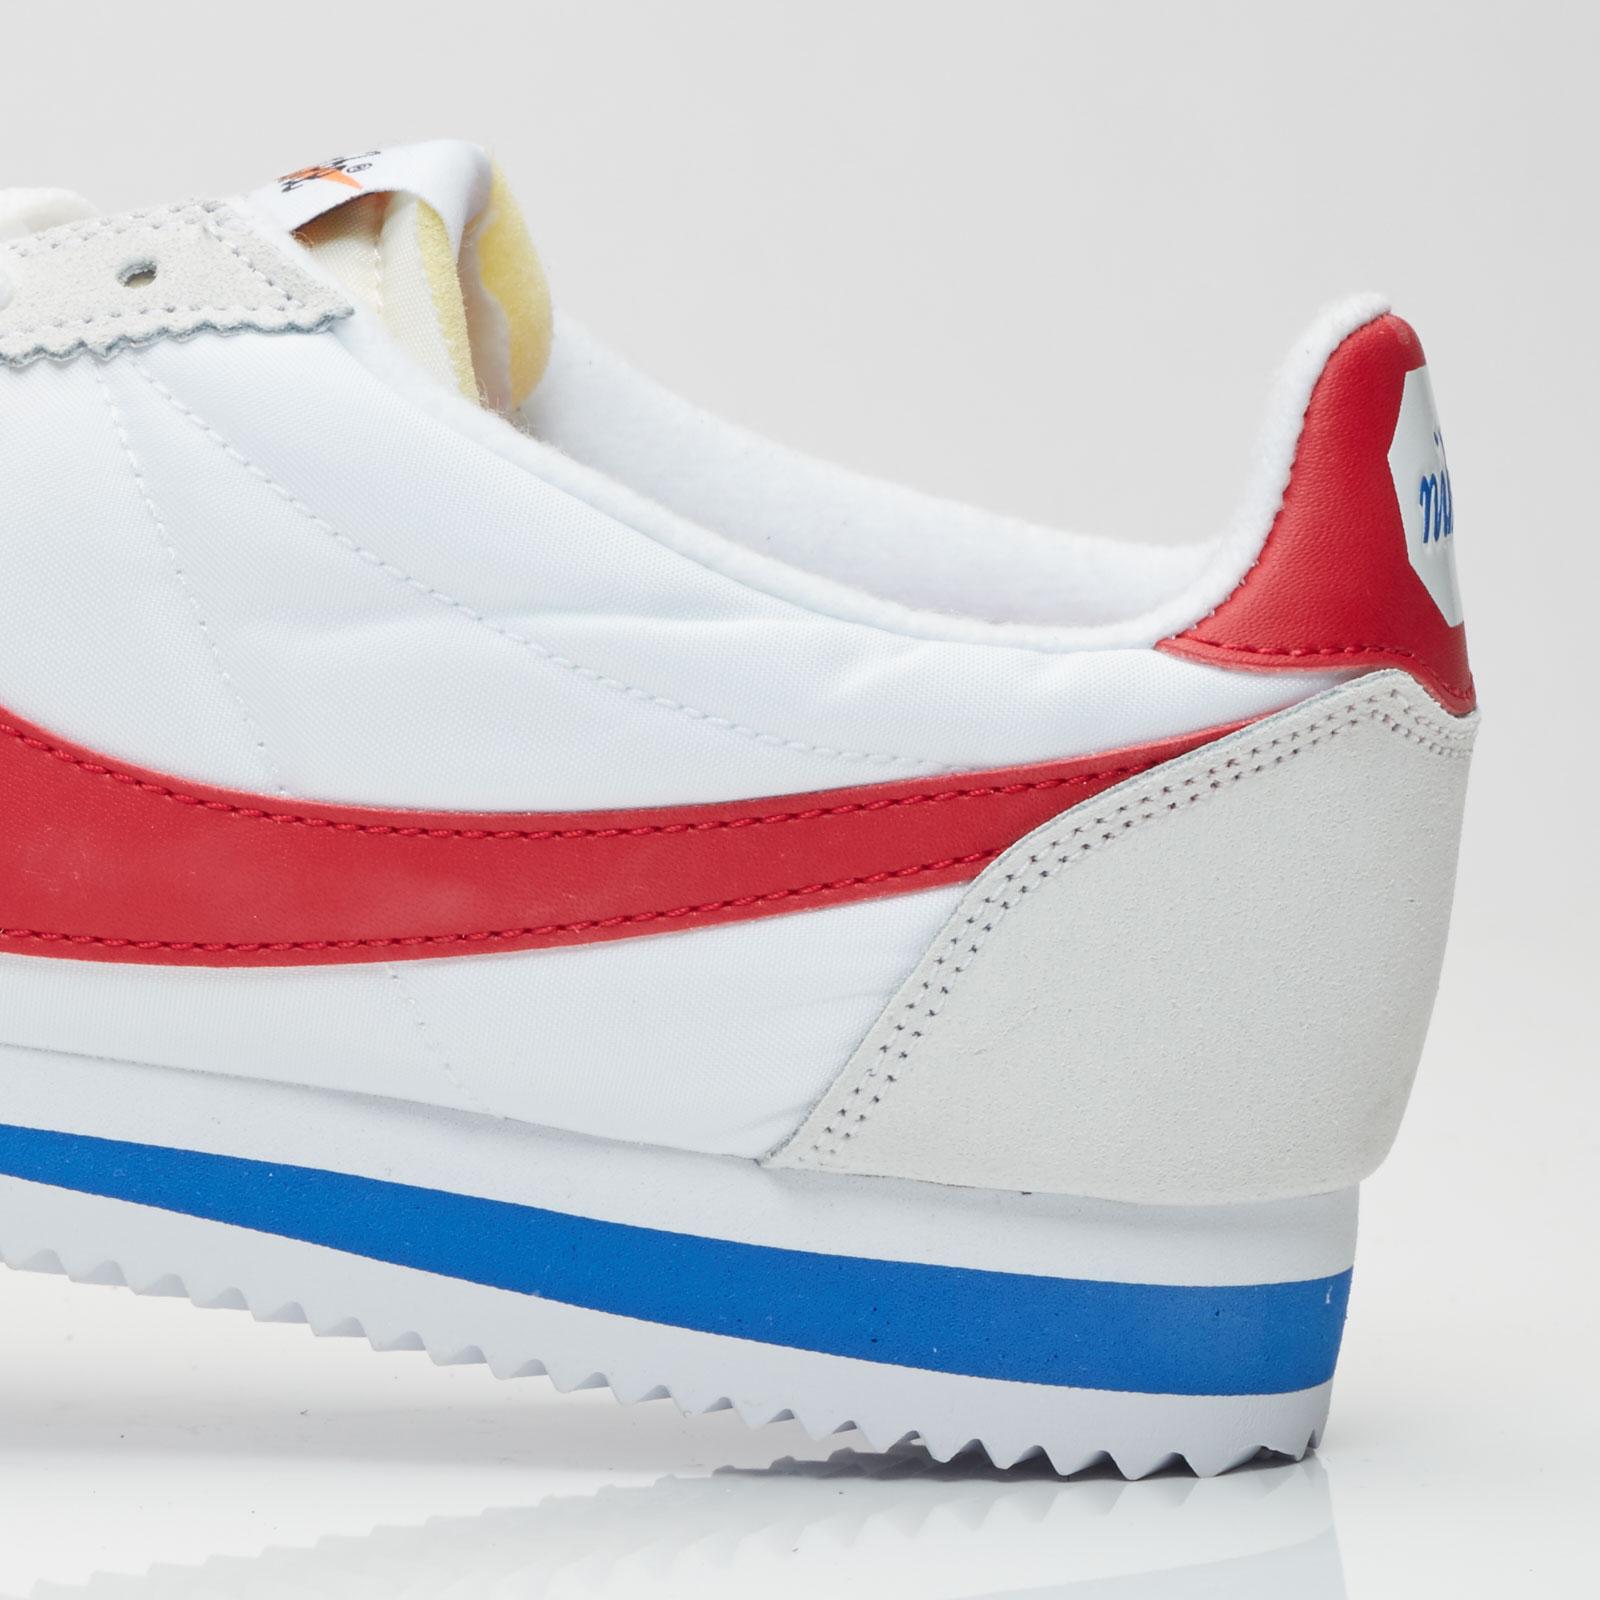 100% authentic 8b4ad c5379 Nike Sportswear Classic Cortez Nylon Premium Qs ...